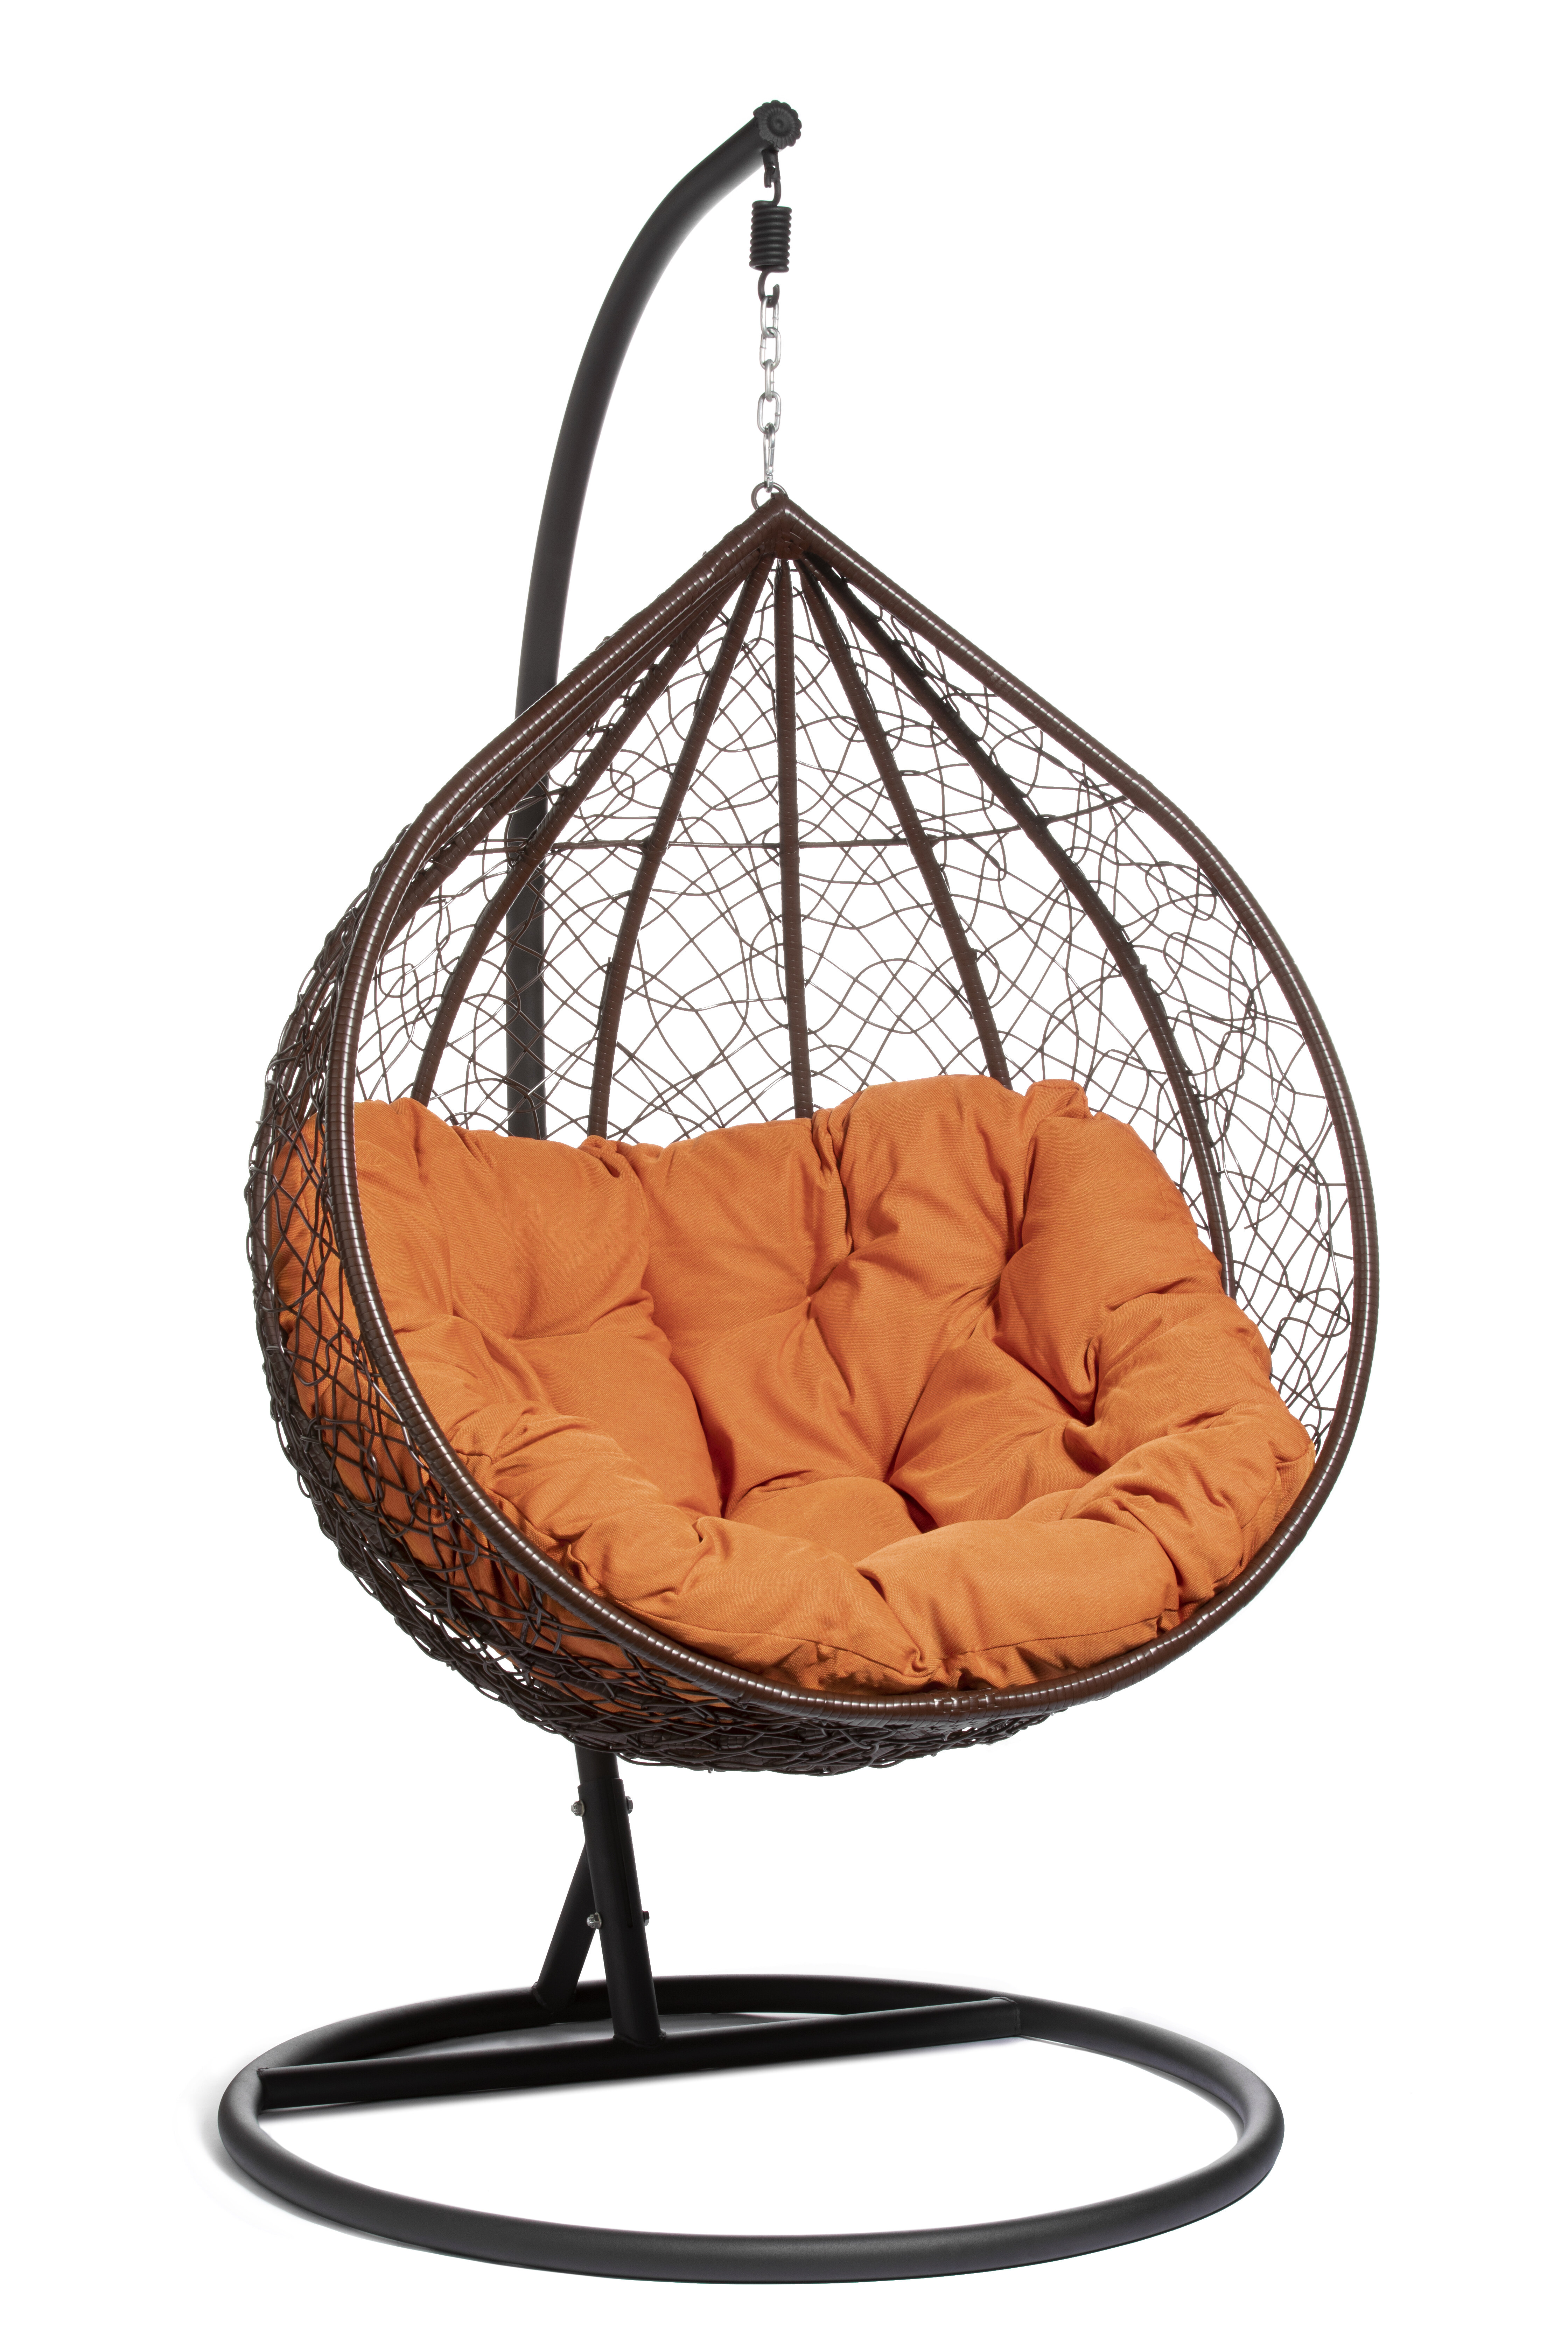 Hanging Lounger Chair Hammocks You Ll Love In 2021 Wayfair